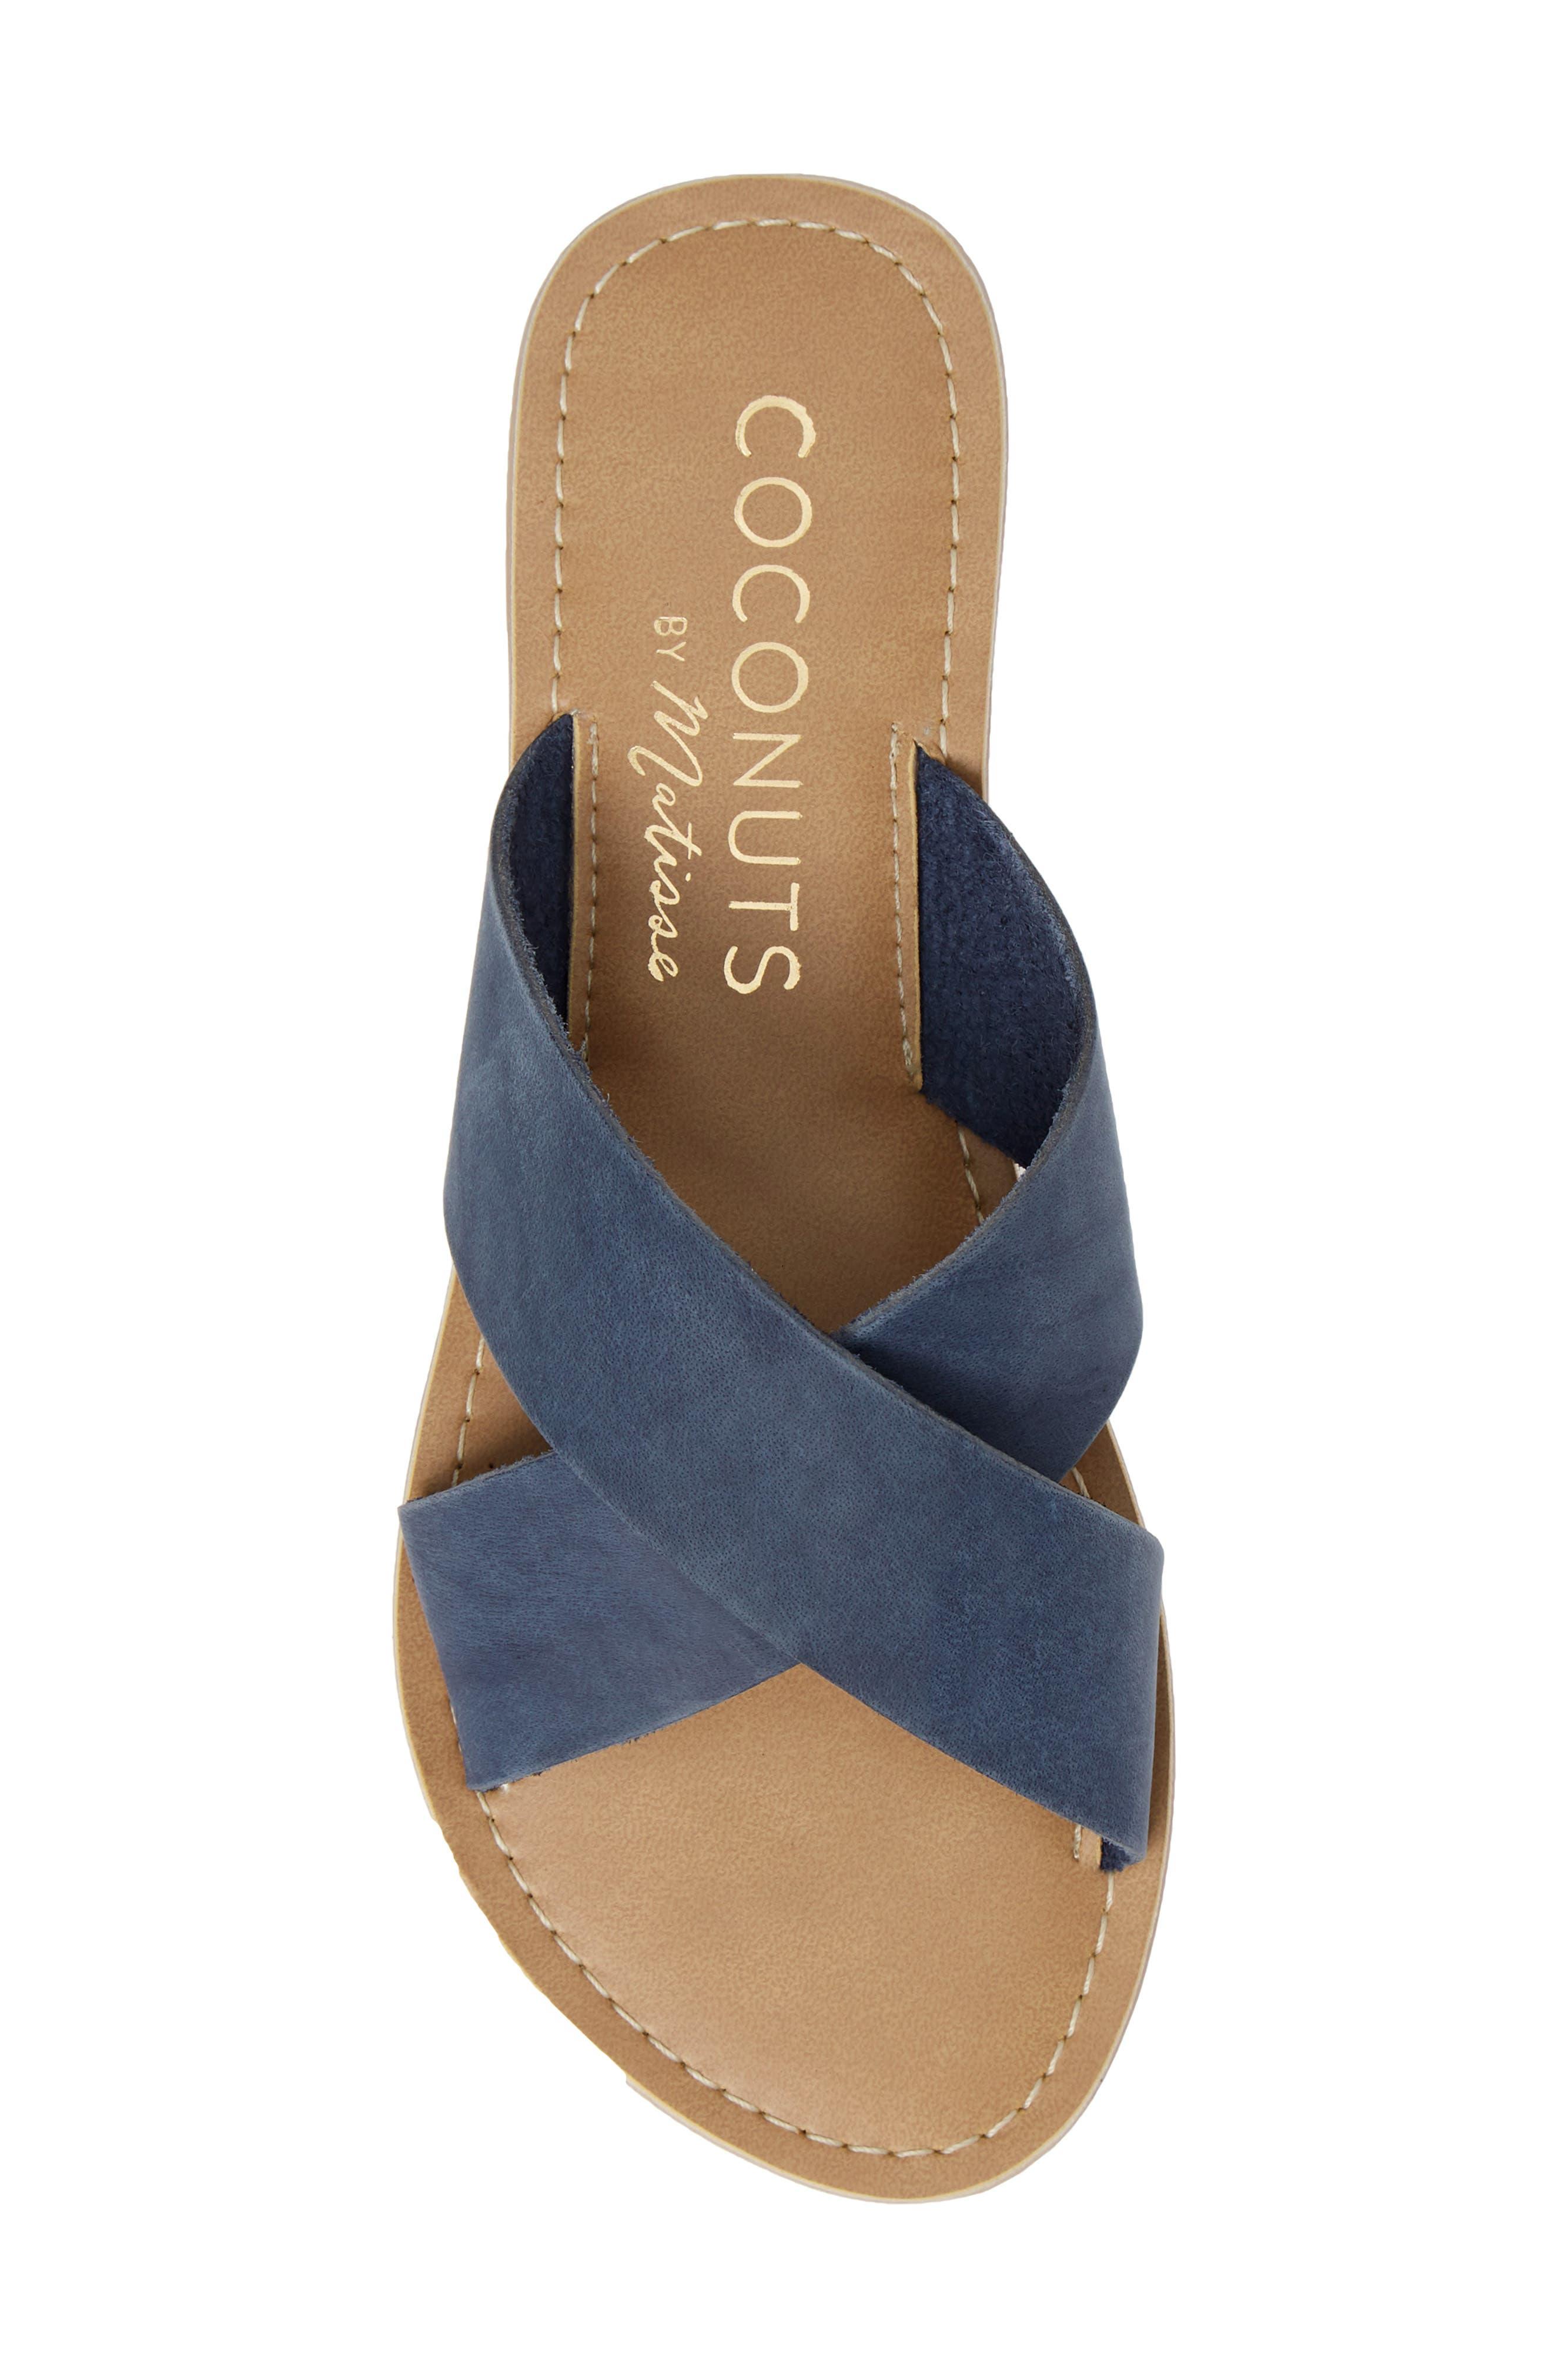 COCONUTS BY MATISSE, Pebble Slide Sandal, Alternate thumbnail 5, color, BLUE NUBUCK LEATHER